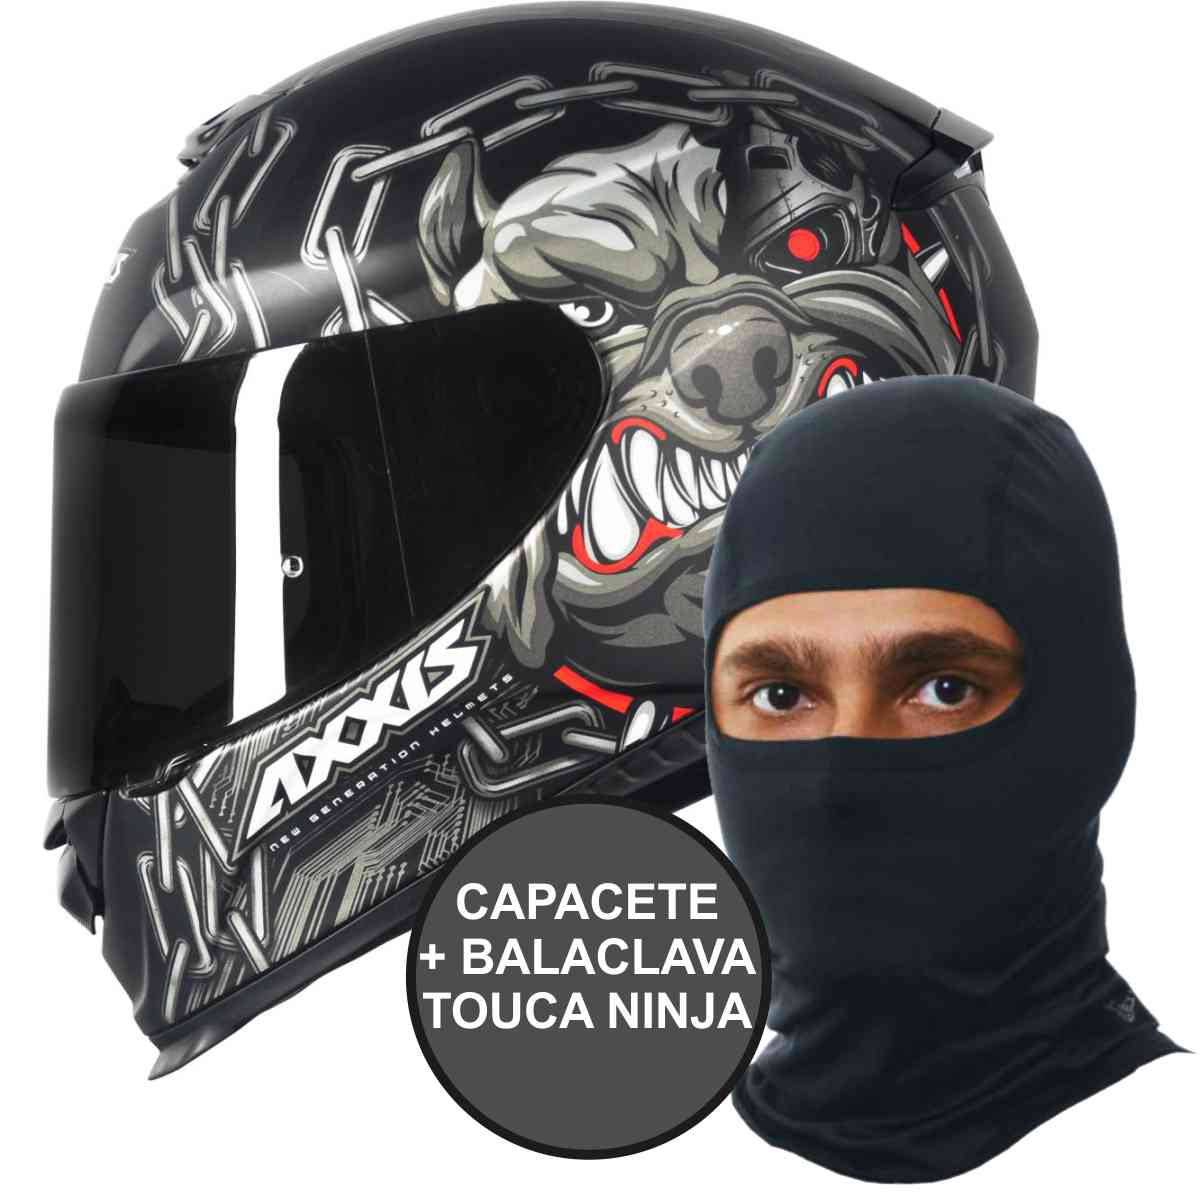 CAPACETE DE MOTO AXXIS EAGLE BULL CYBER MATT BLACK/GREY + BALACLAVA TOUCA NINJA